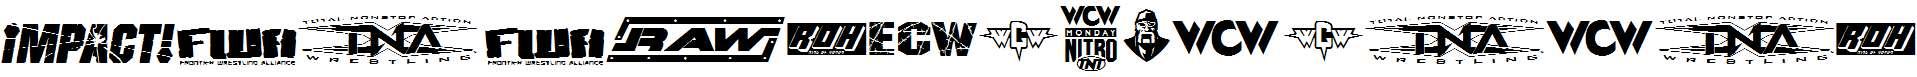 Pro-Wrestling-Logos